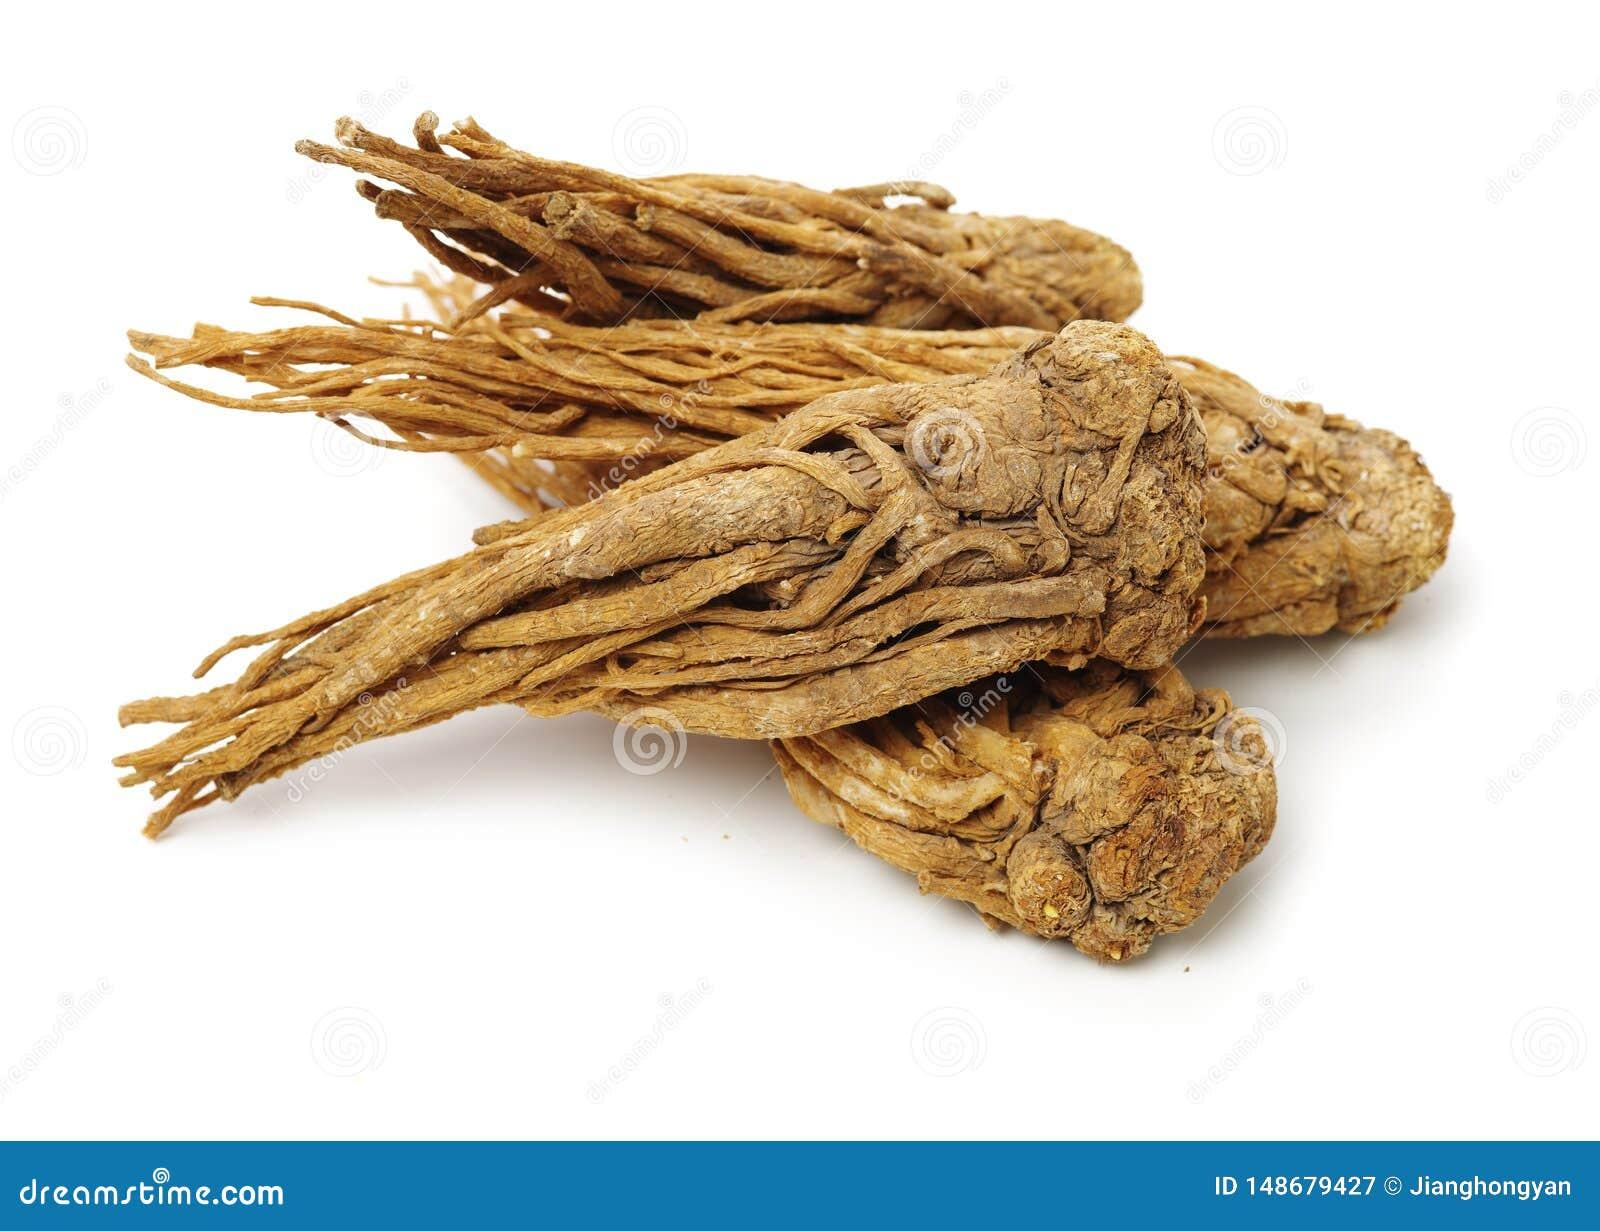 Angelica root